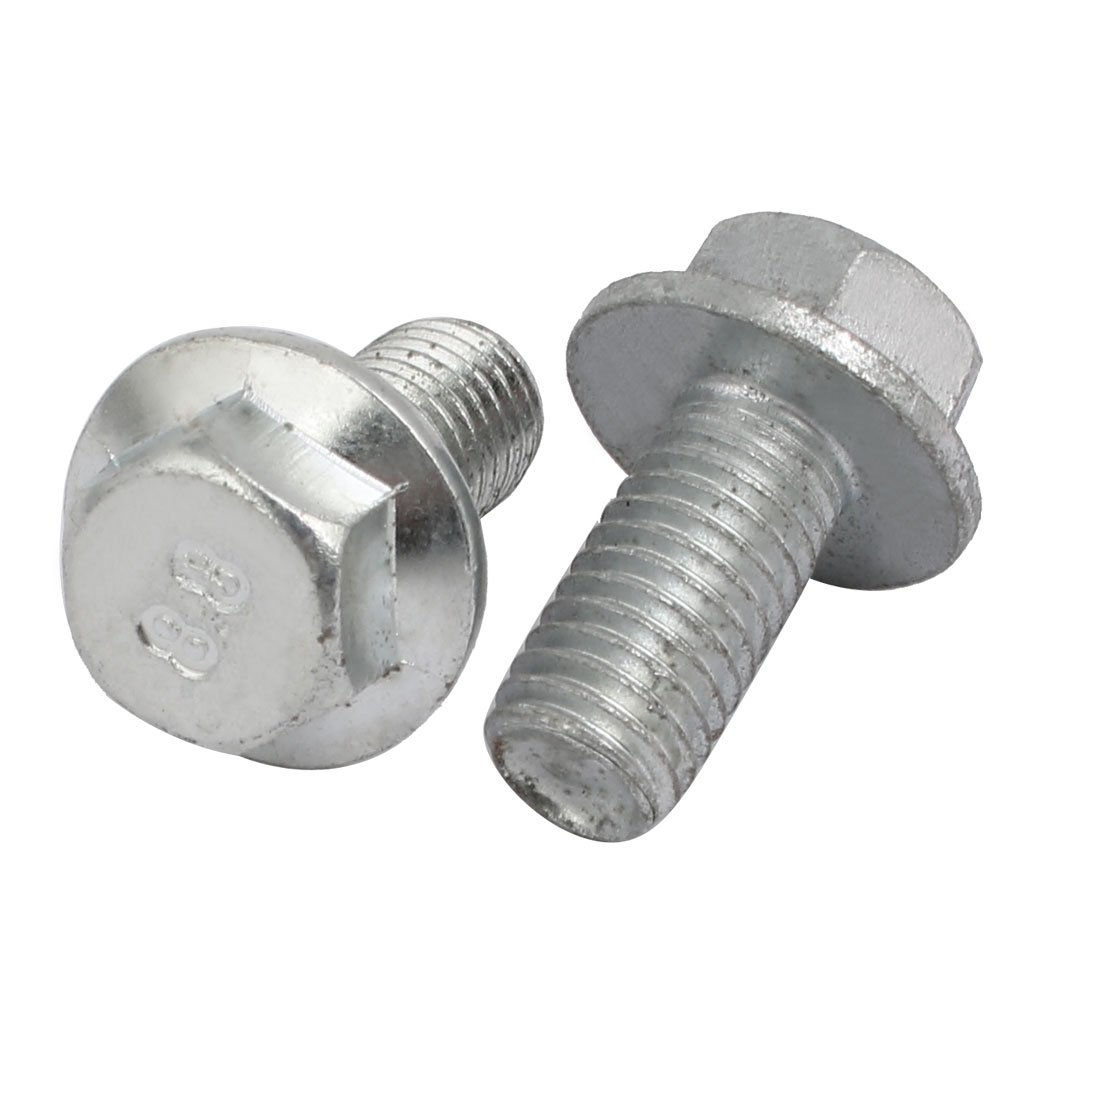 M10x20mm 8.8 Grade Carbon Steel Flange Hex Head Left Hand Thread Bolt 2pcs